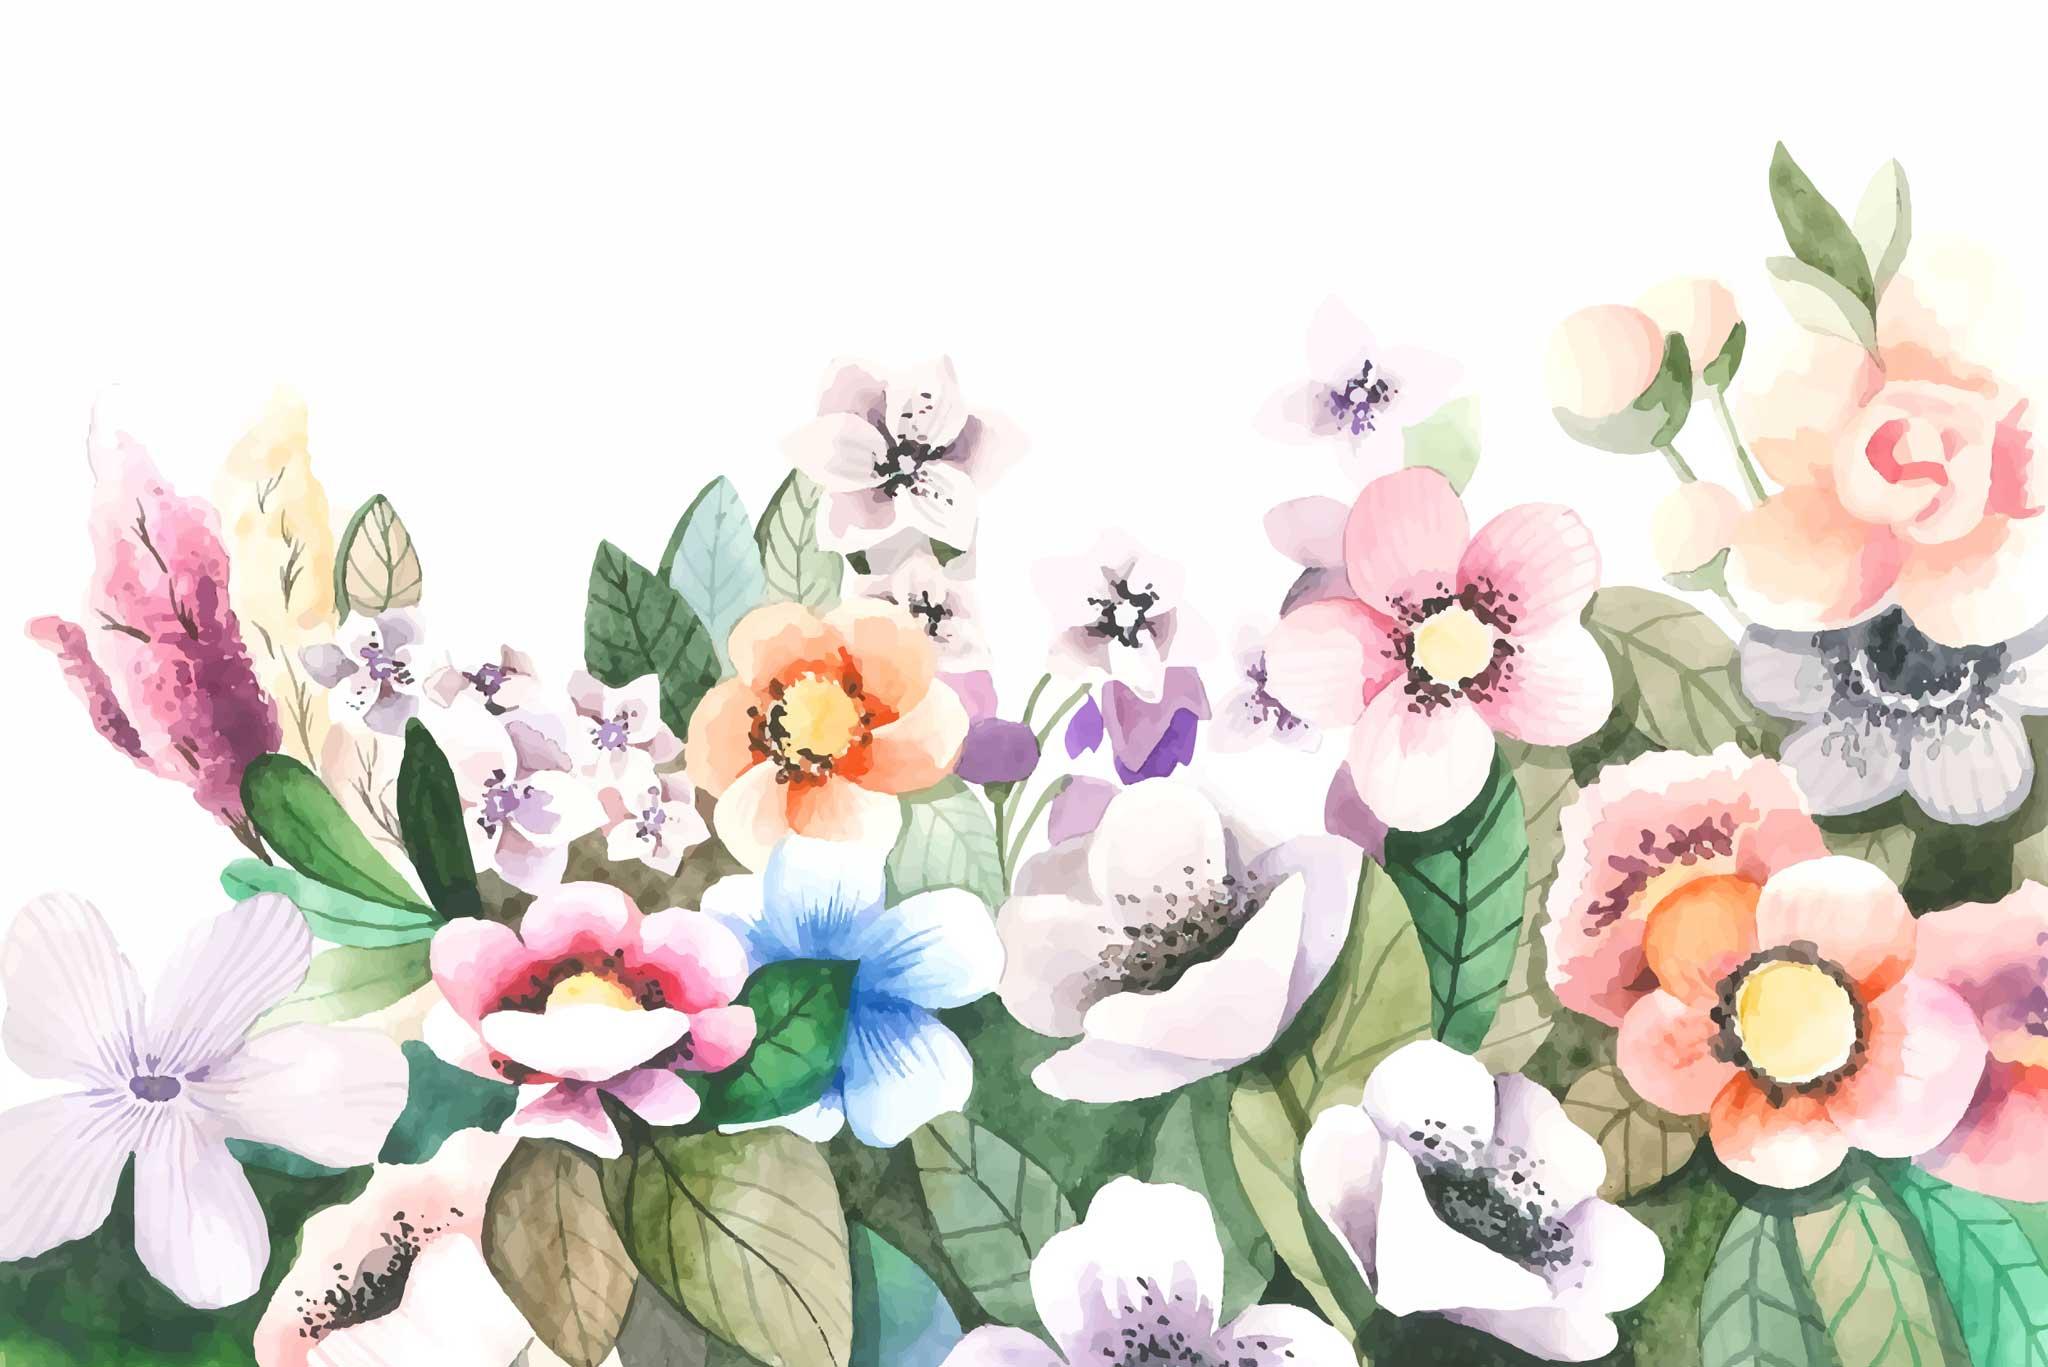 tapet-fototapet-design-decor-mural-customizabil-comanda-personalizat-bucuresti-daring-prints-motiv-model-copii-desen-acuarela-flori-fluturi-pastel